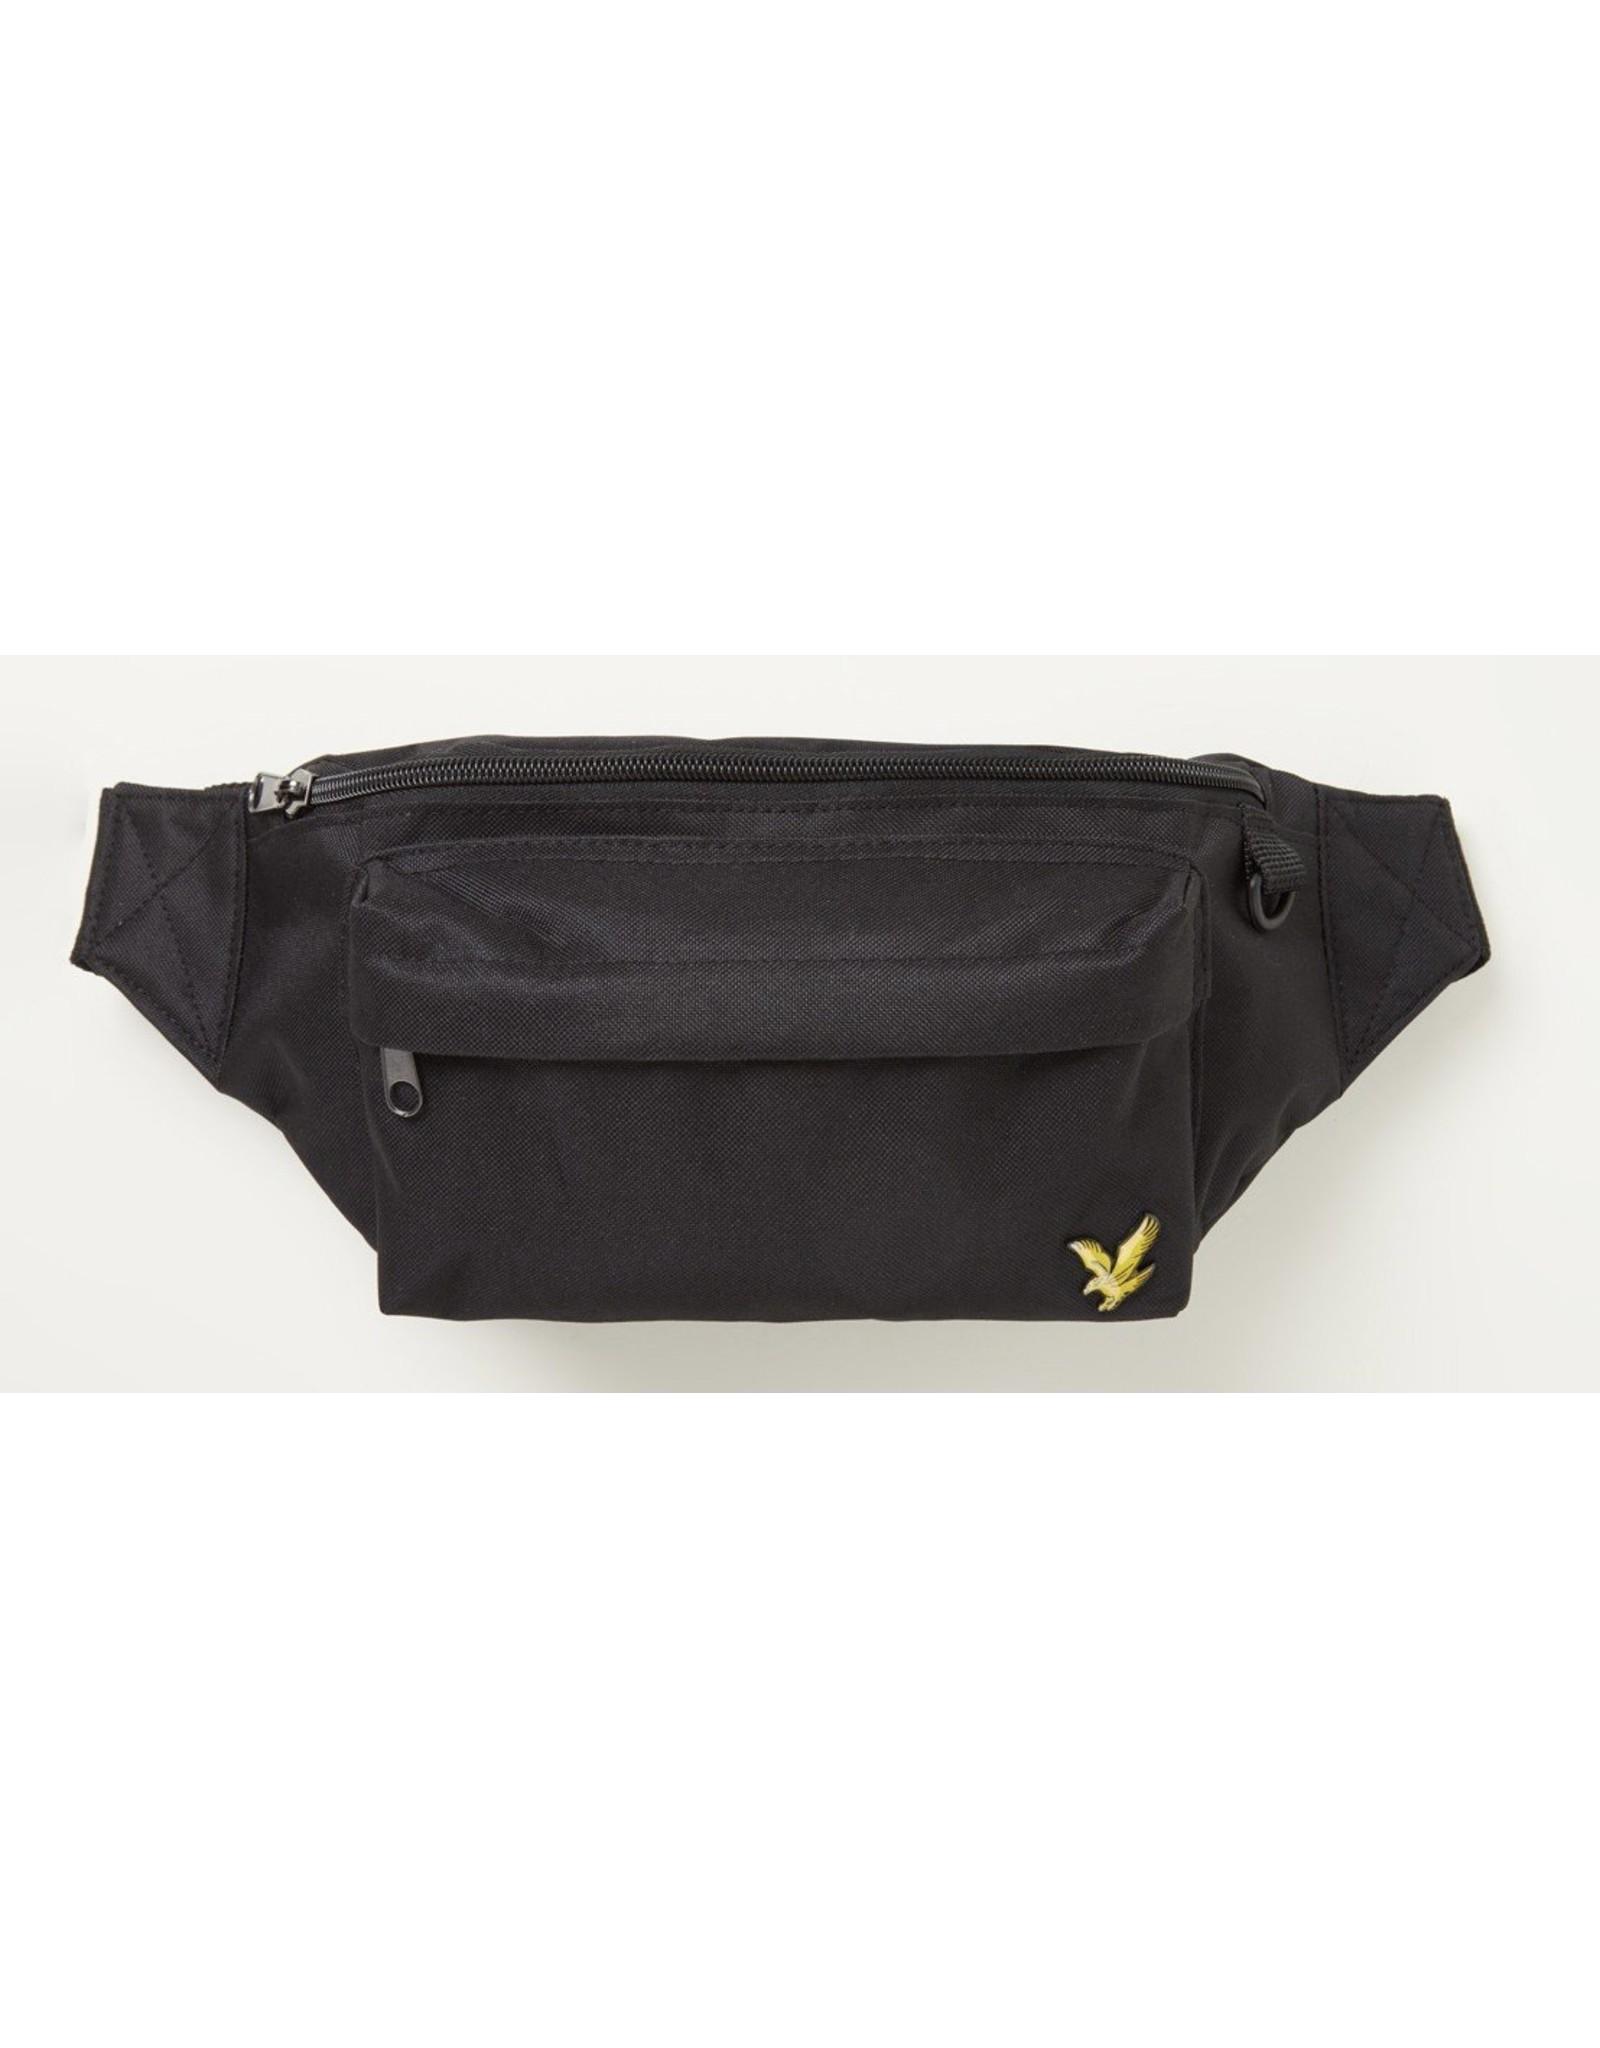 Lyle & Scott LSC0937 Cross Body Bag